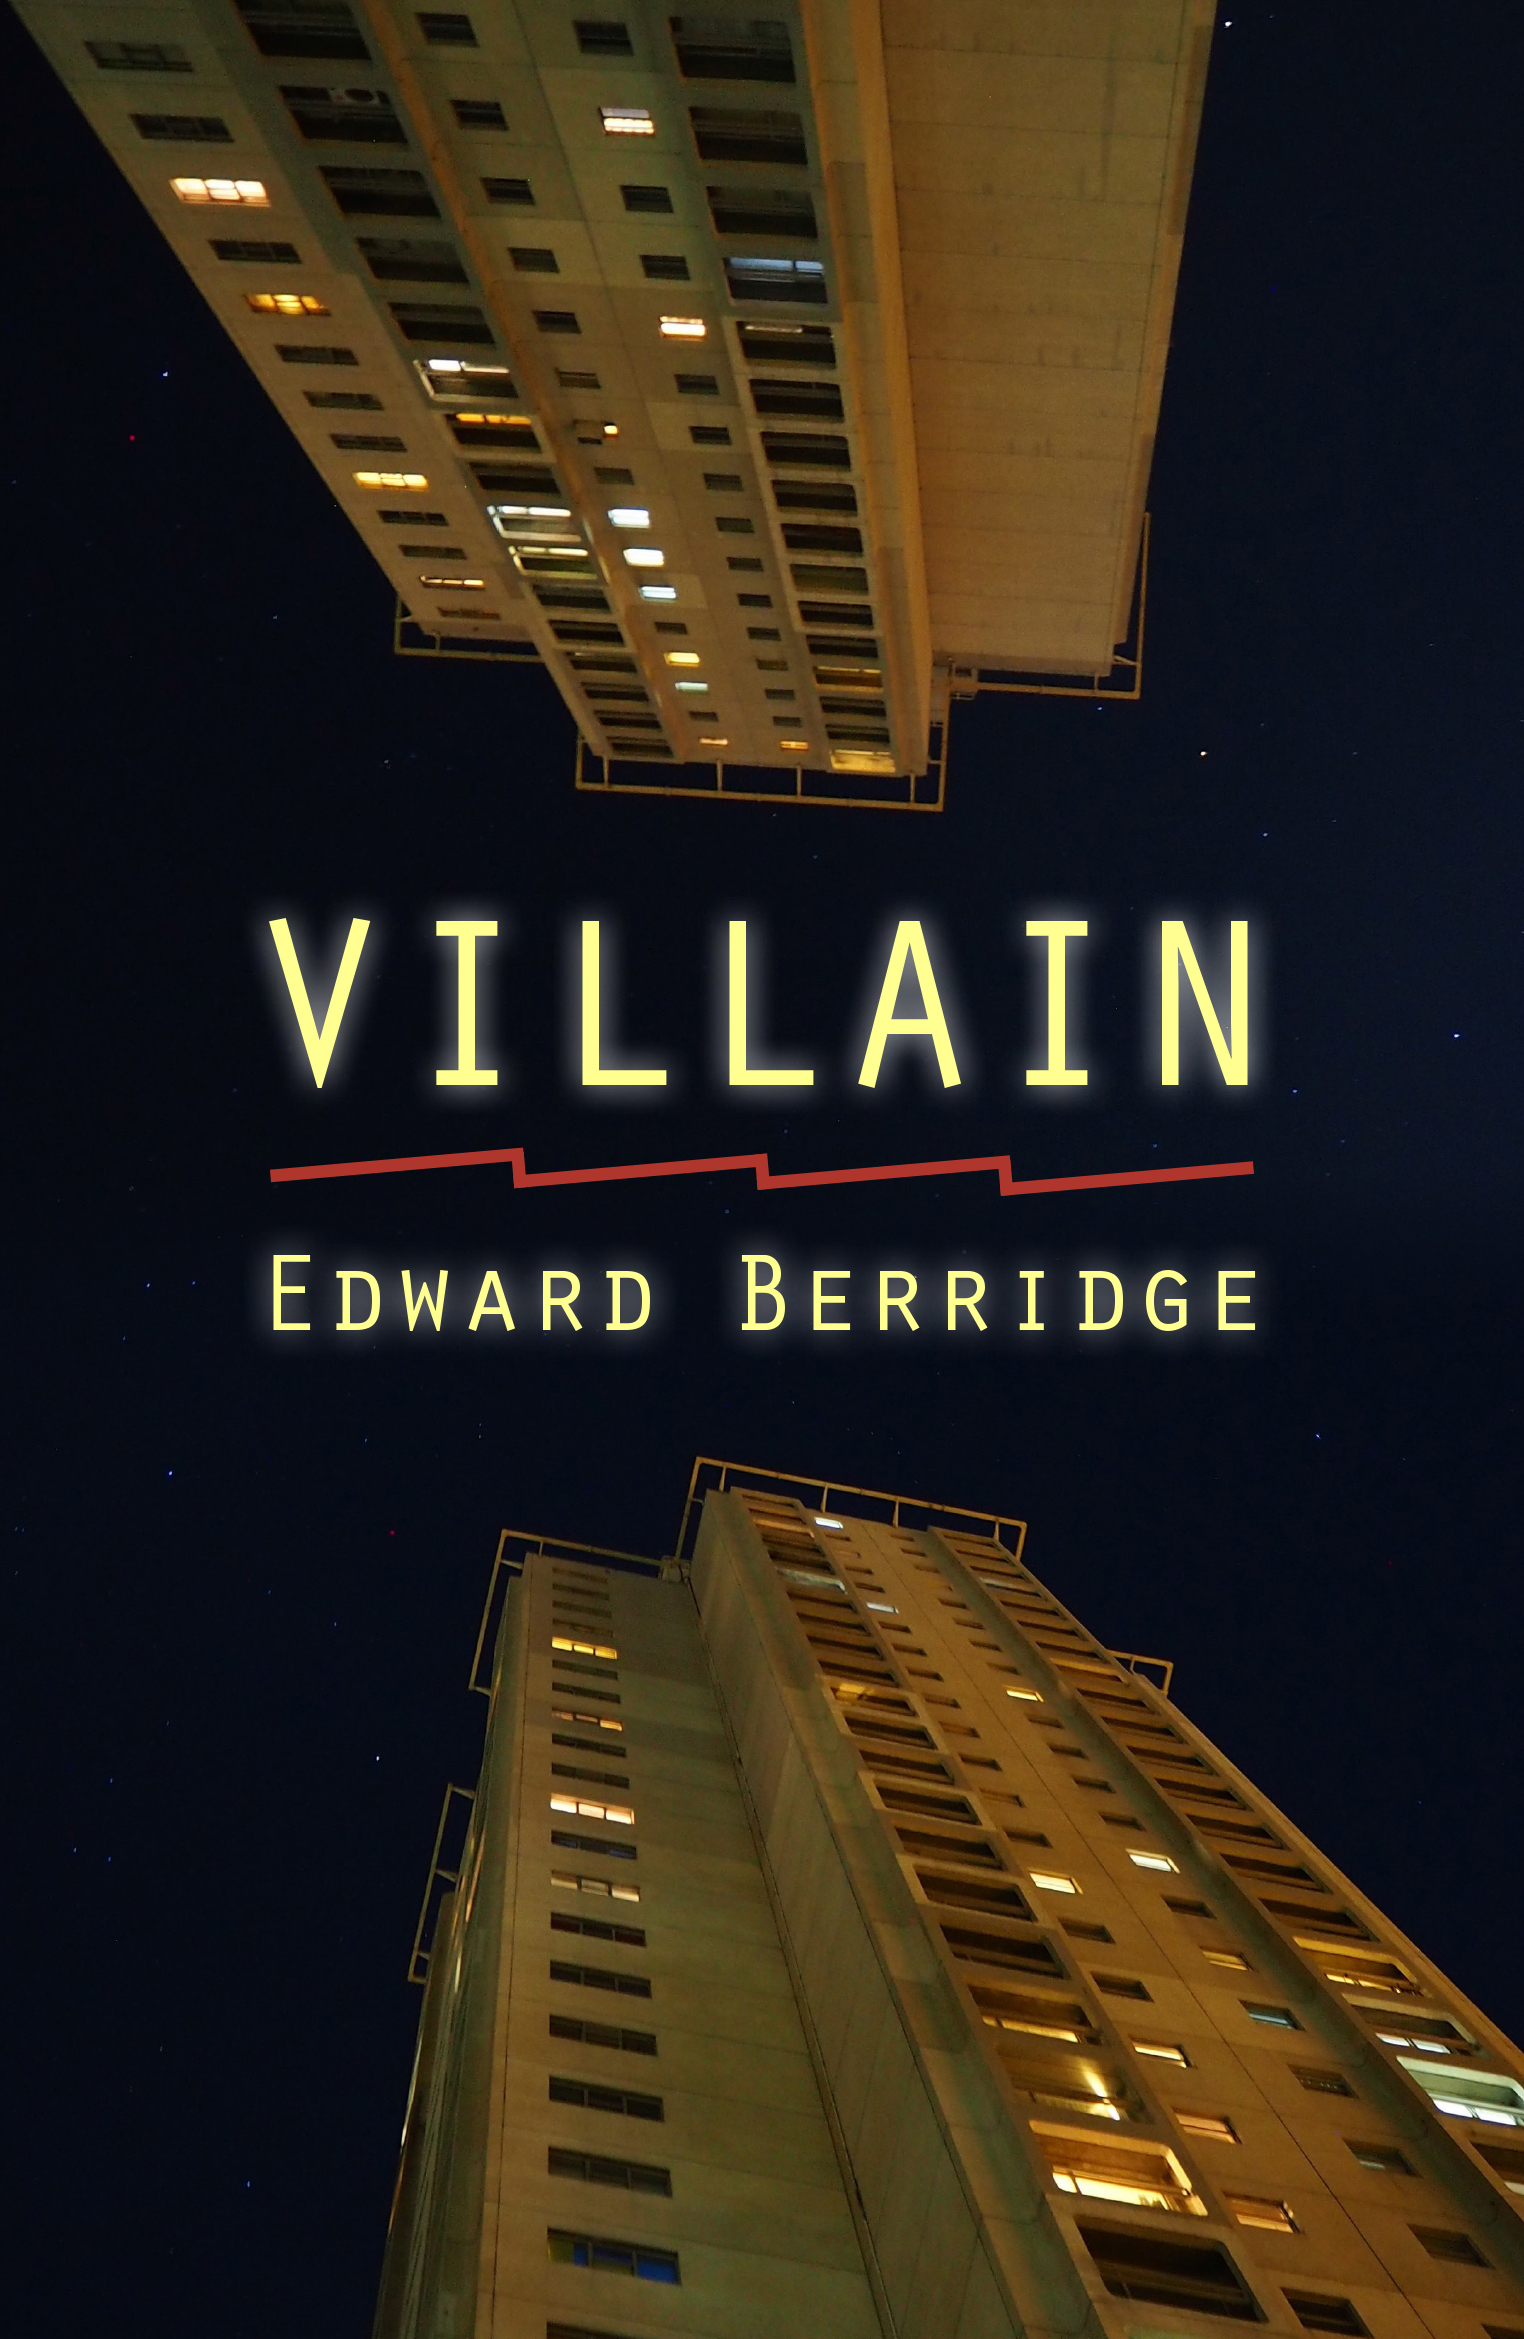 Villain by Edward Berridge Front cover.jpg